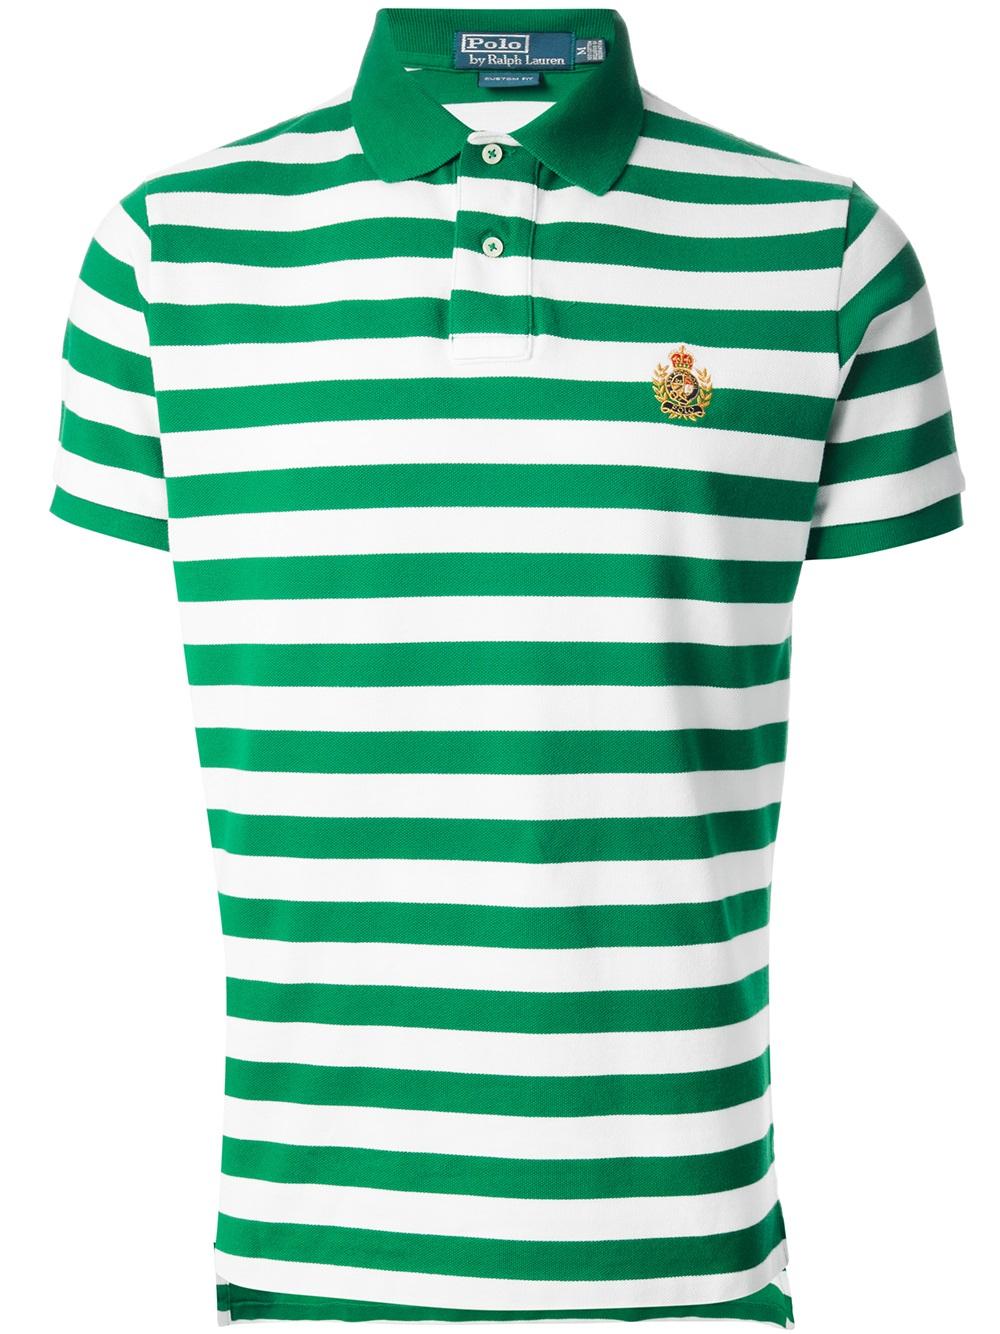 Polo ralph lauren Striped Polo Shirt in Green for Men | Lyst